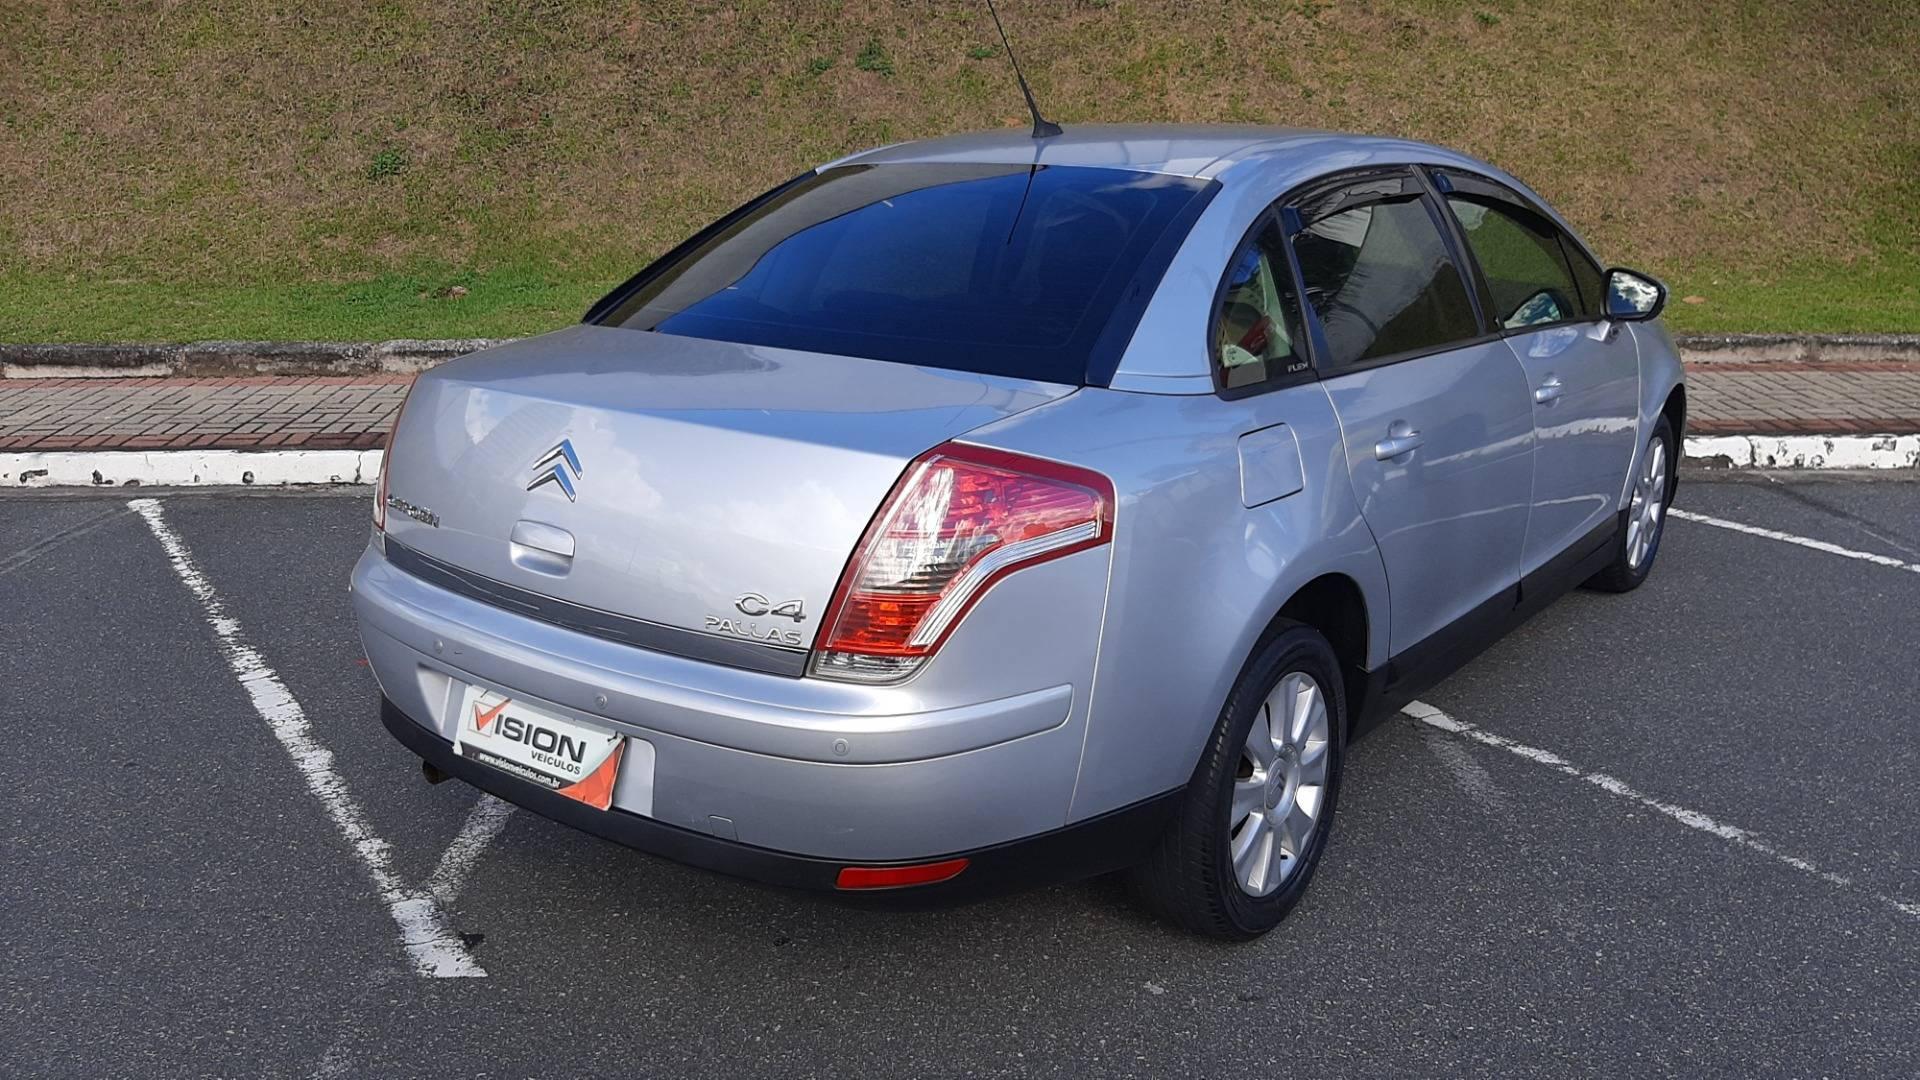 CITROEN C4 Sedan 2.0 16V 4P GLX PALLAS FLEX, Foto 3